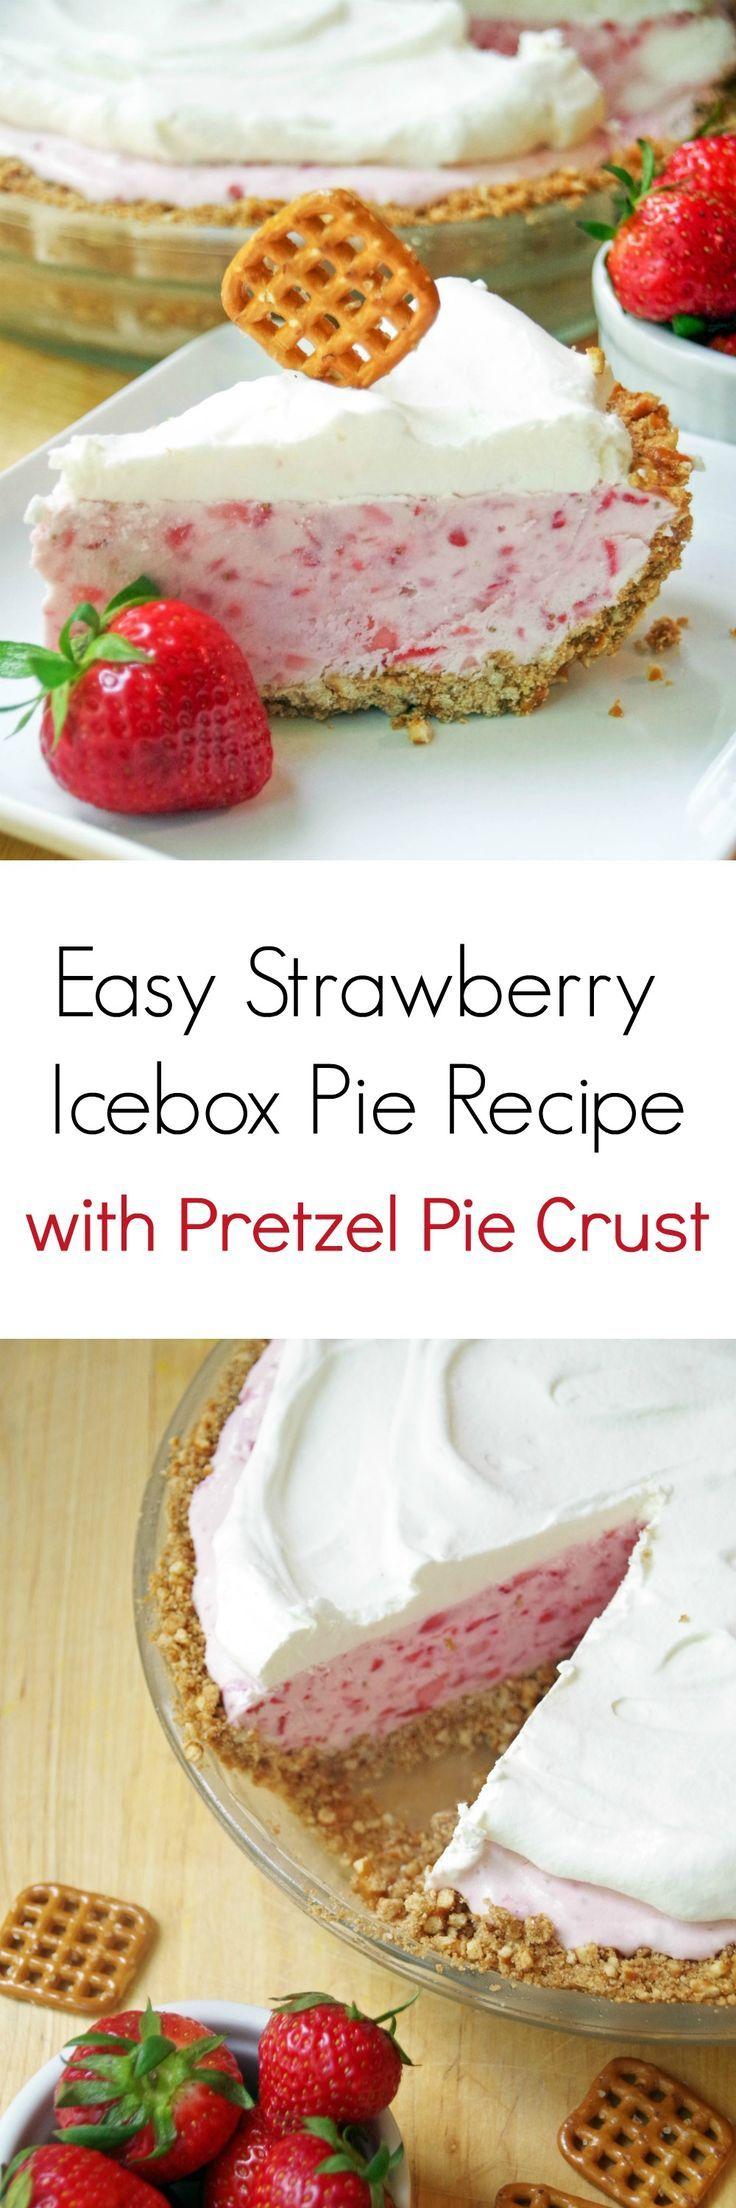 Need a simple summer dessert recipe Try this Easy Strawberry Icebox Pie Recipe with Pretzel Pie Crust! (Favorite Desserts Recipes)